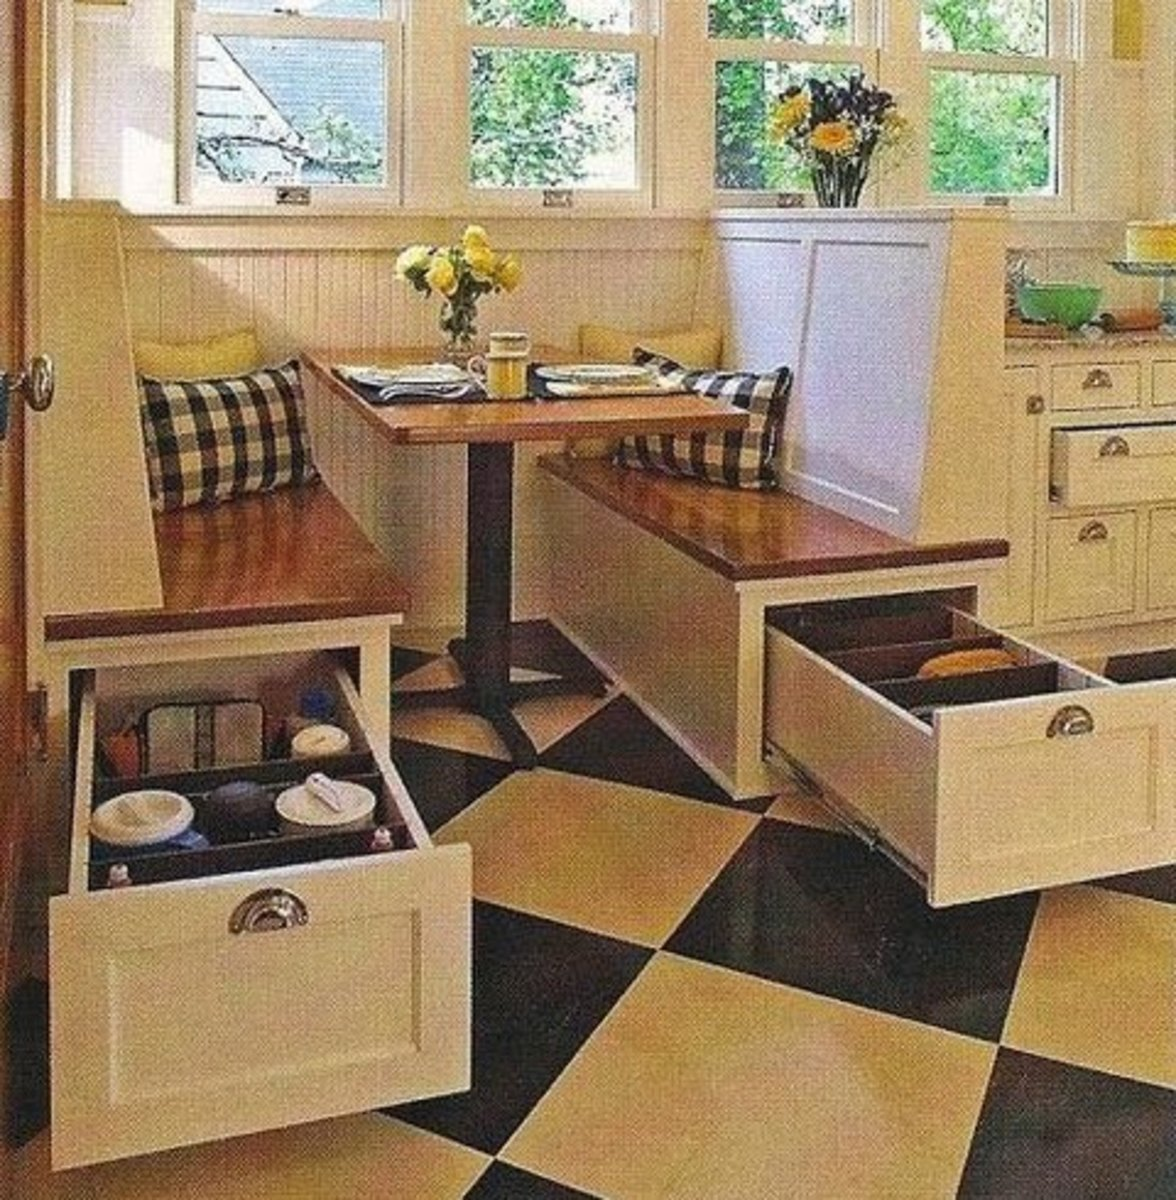 Small Kitchen Organizing Ideas   Click Pic for 20 DIY Kitchen Organization Ideas Underseat Storage